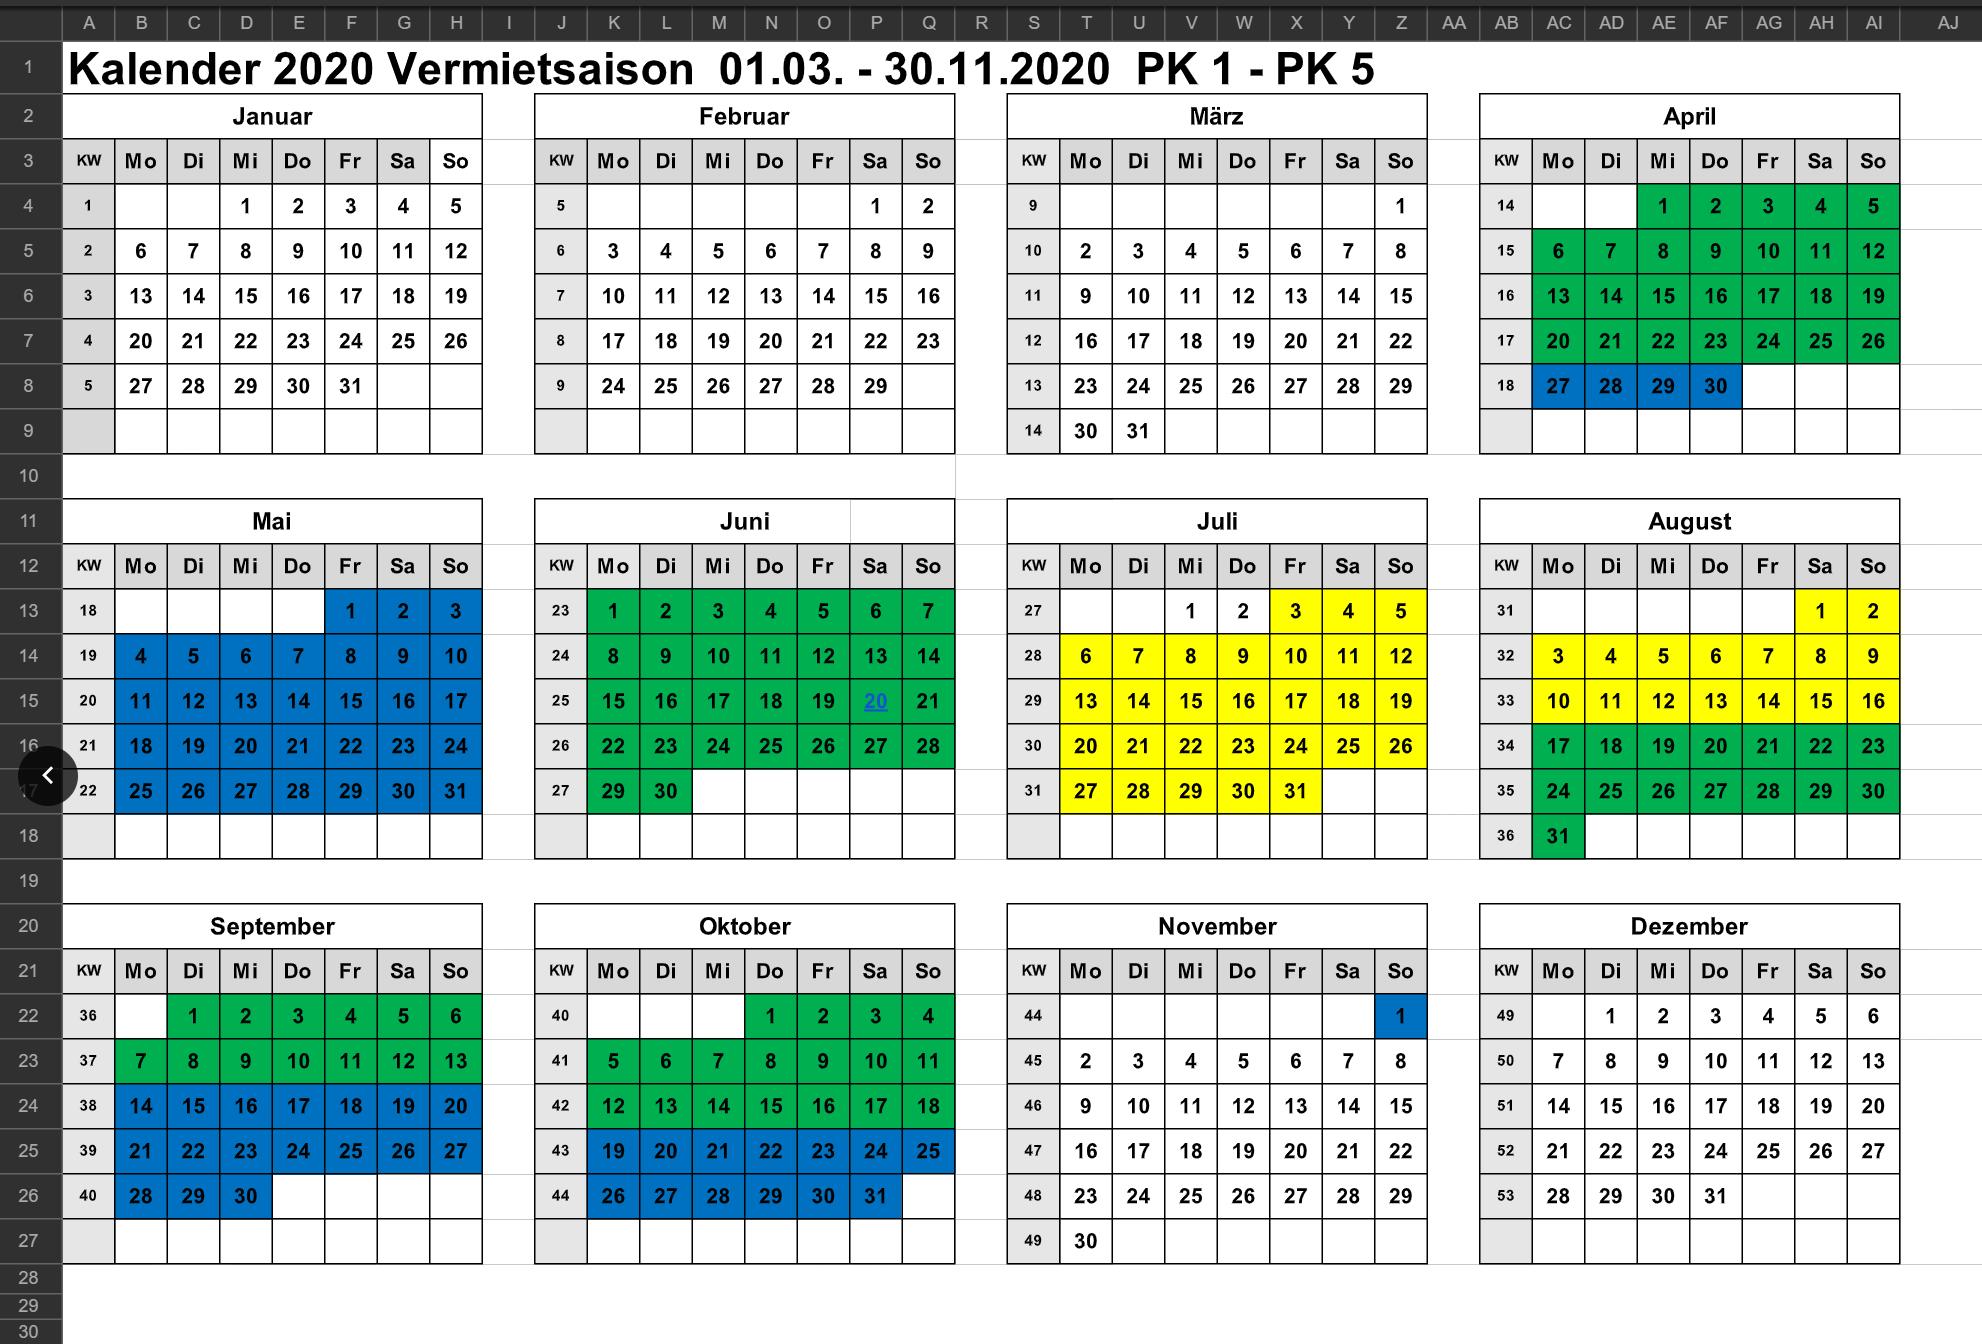 Wohnmobil Mieten Saisonkalender 2020